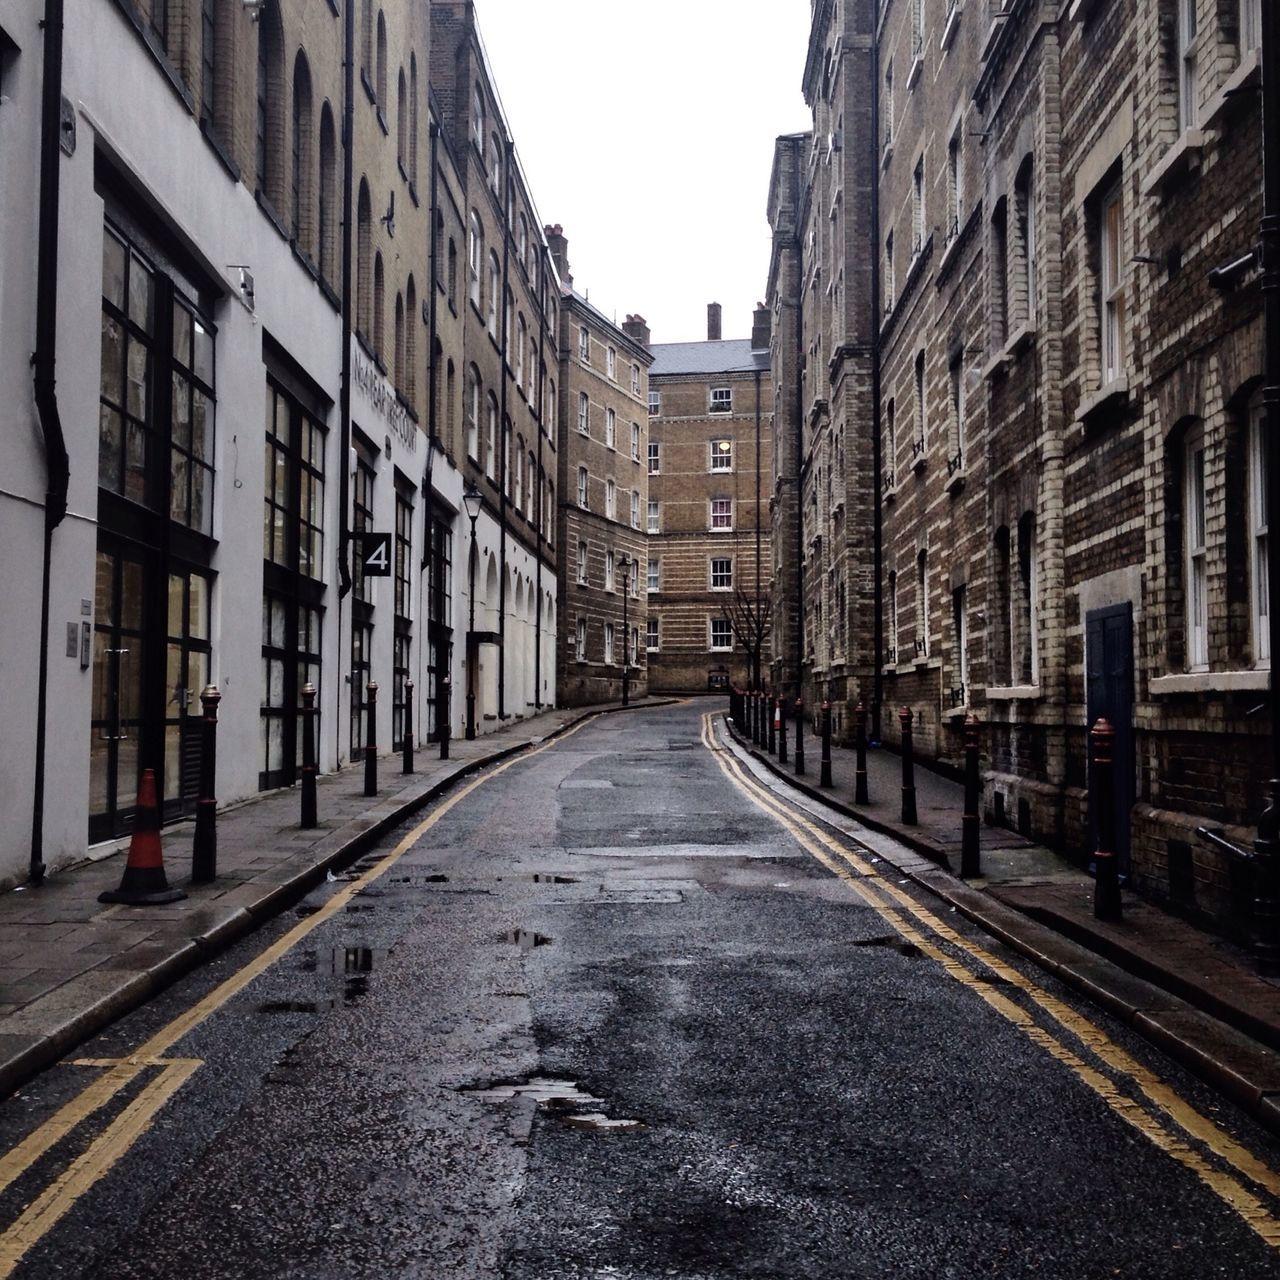 Streets Of London Empty Street Brick House Market Bestsellers April 2016 Bestsellers